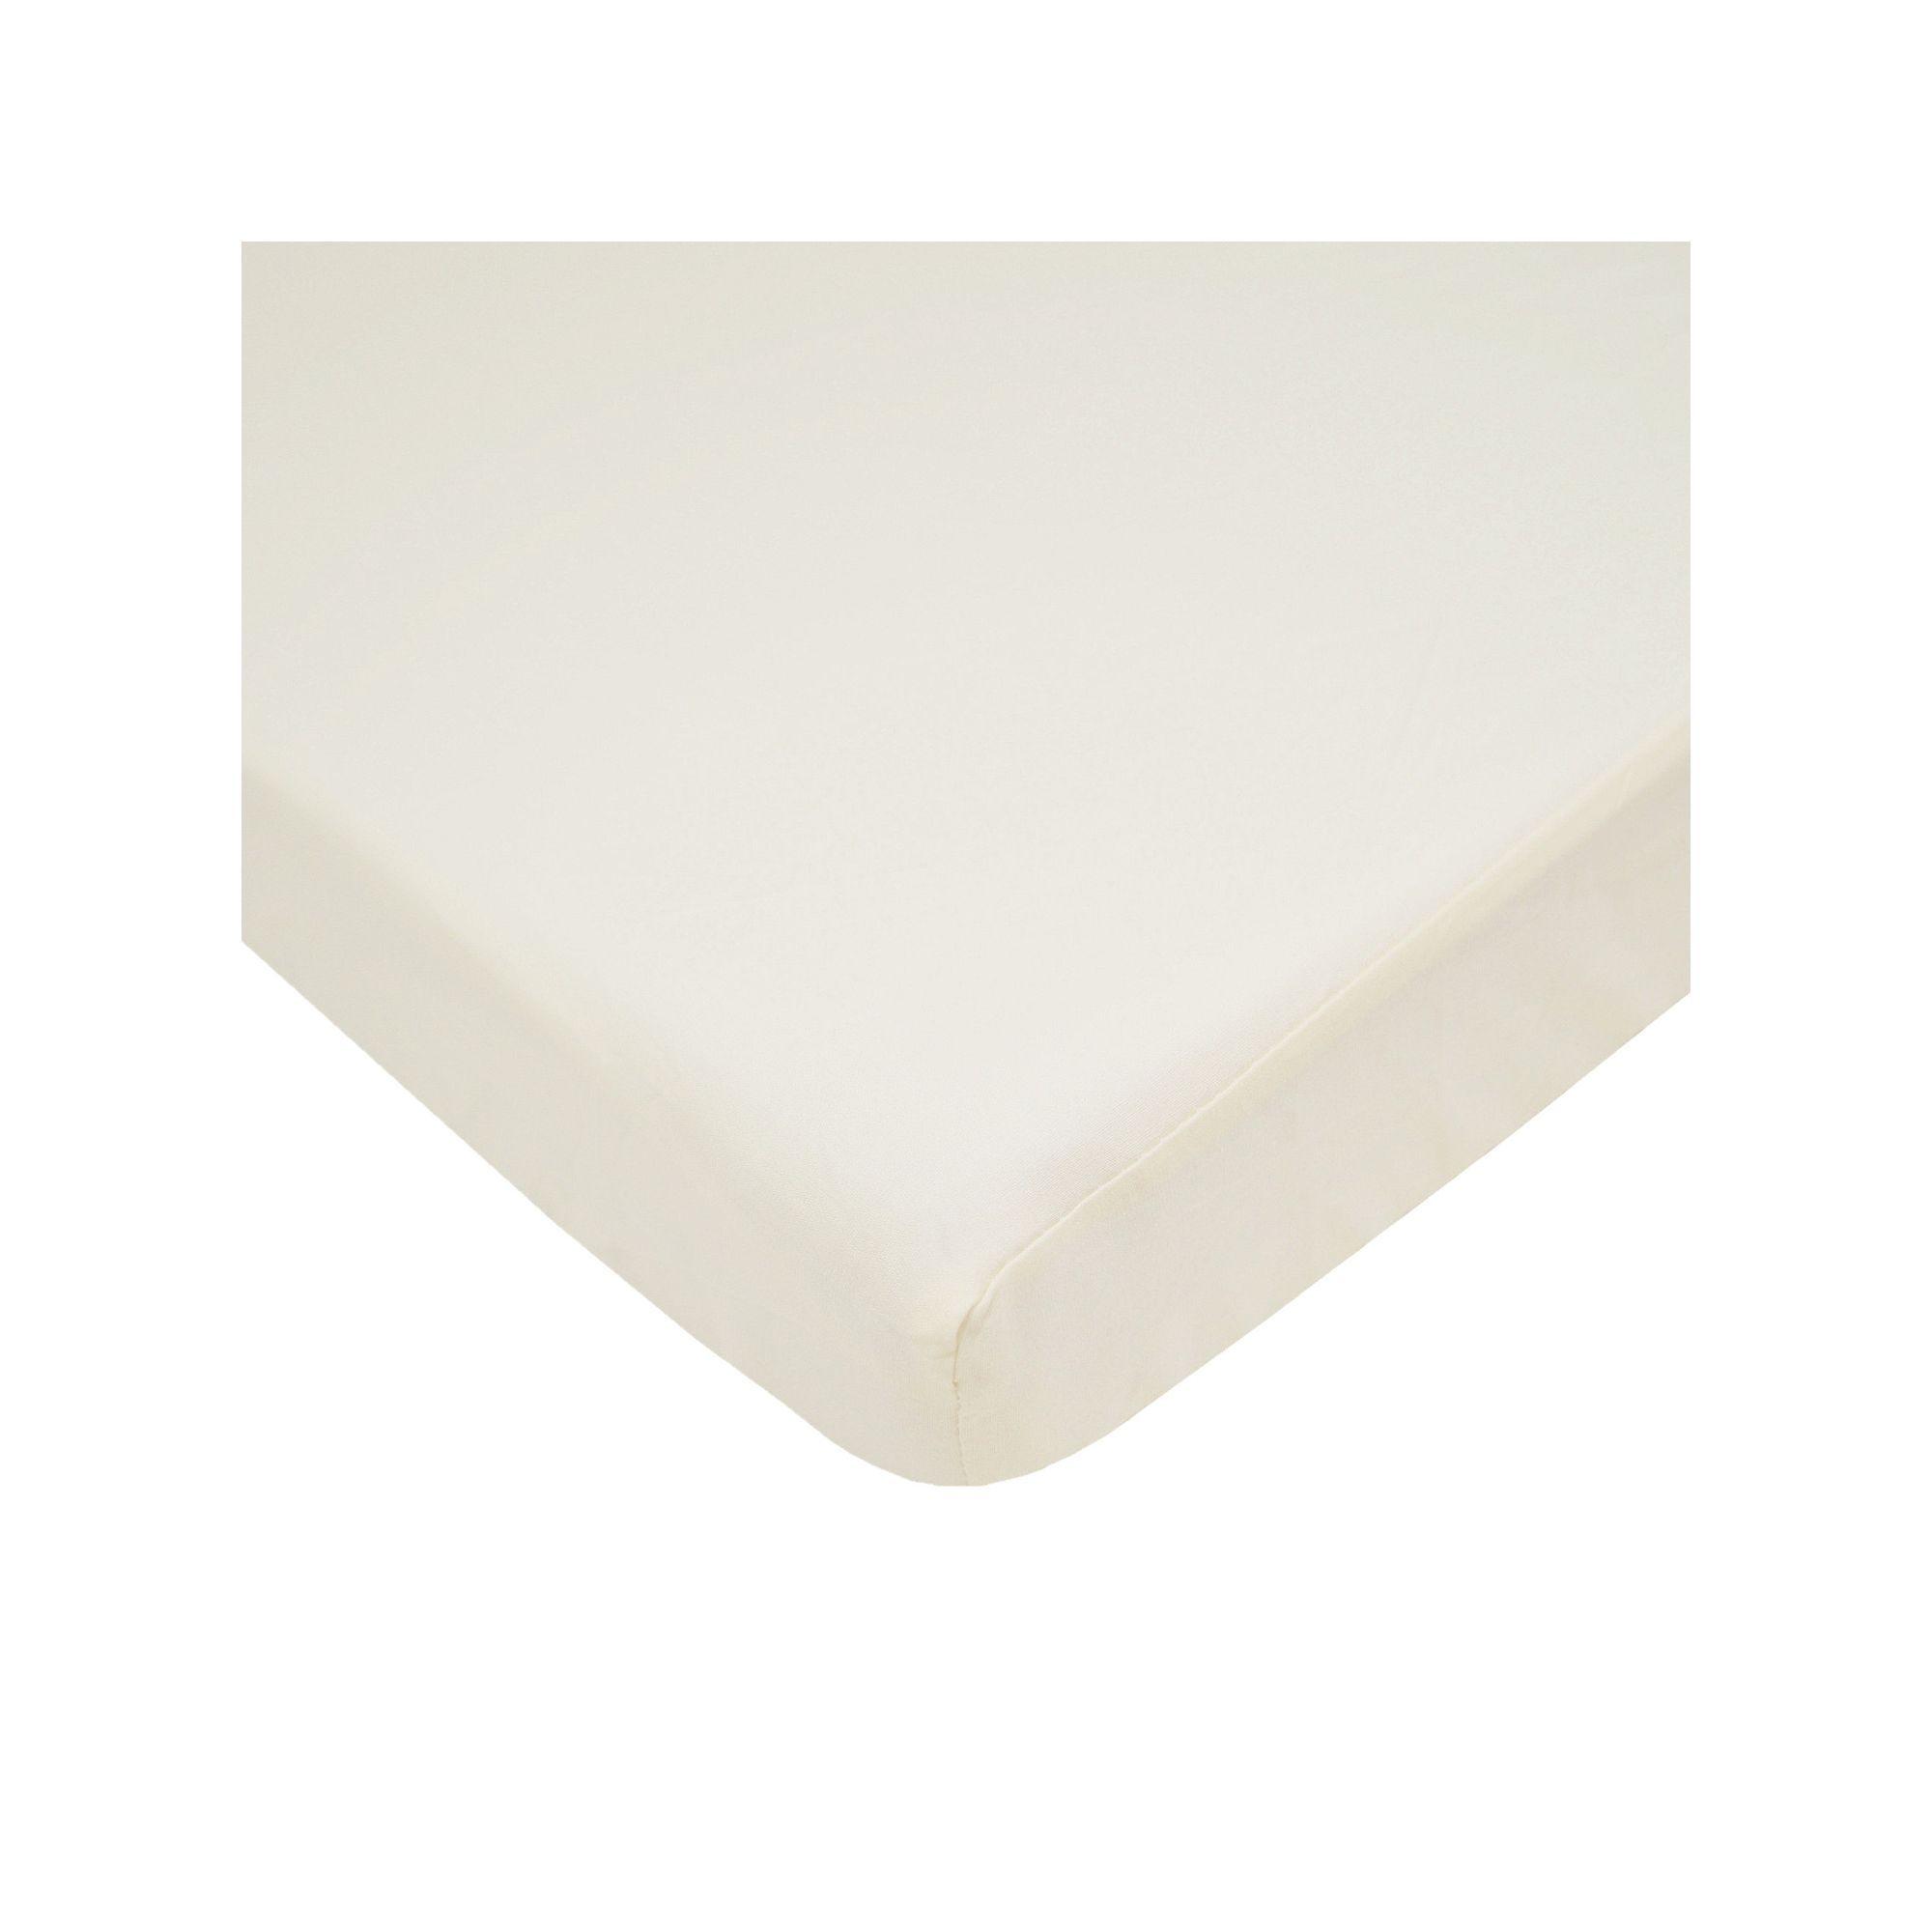 Tl Care Crib Sheet, White